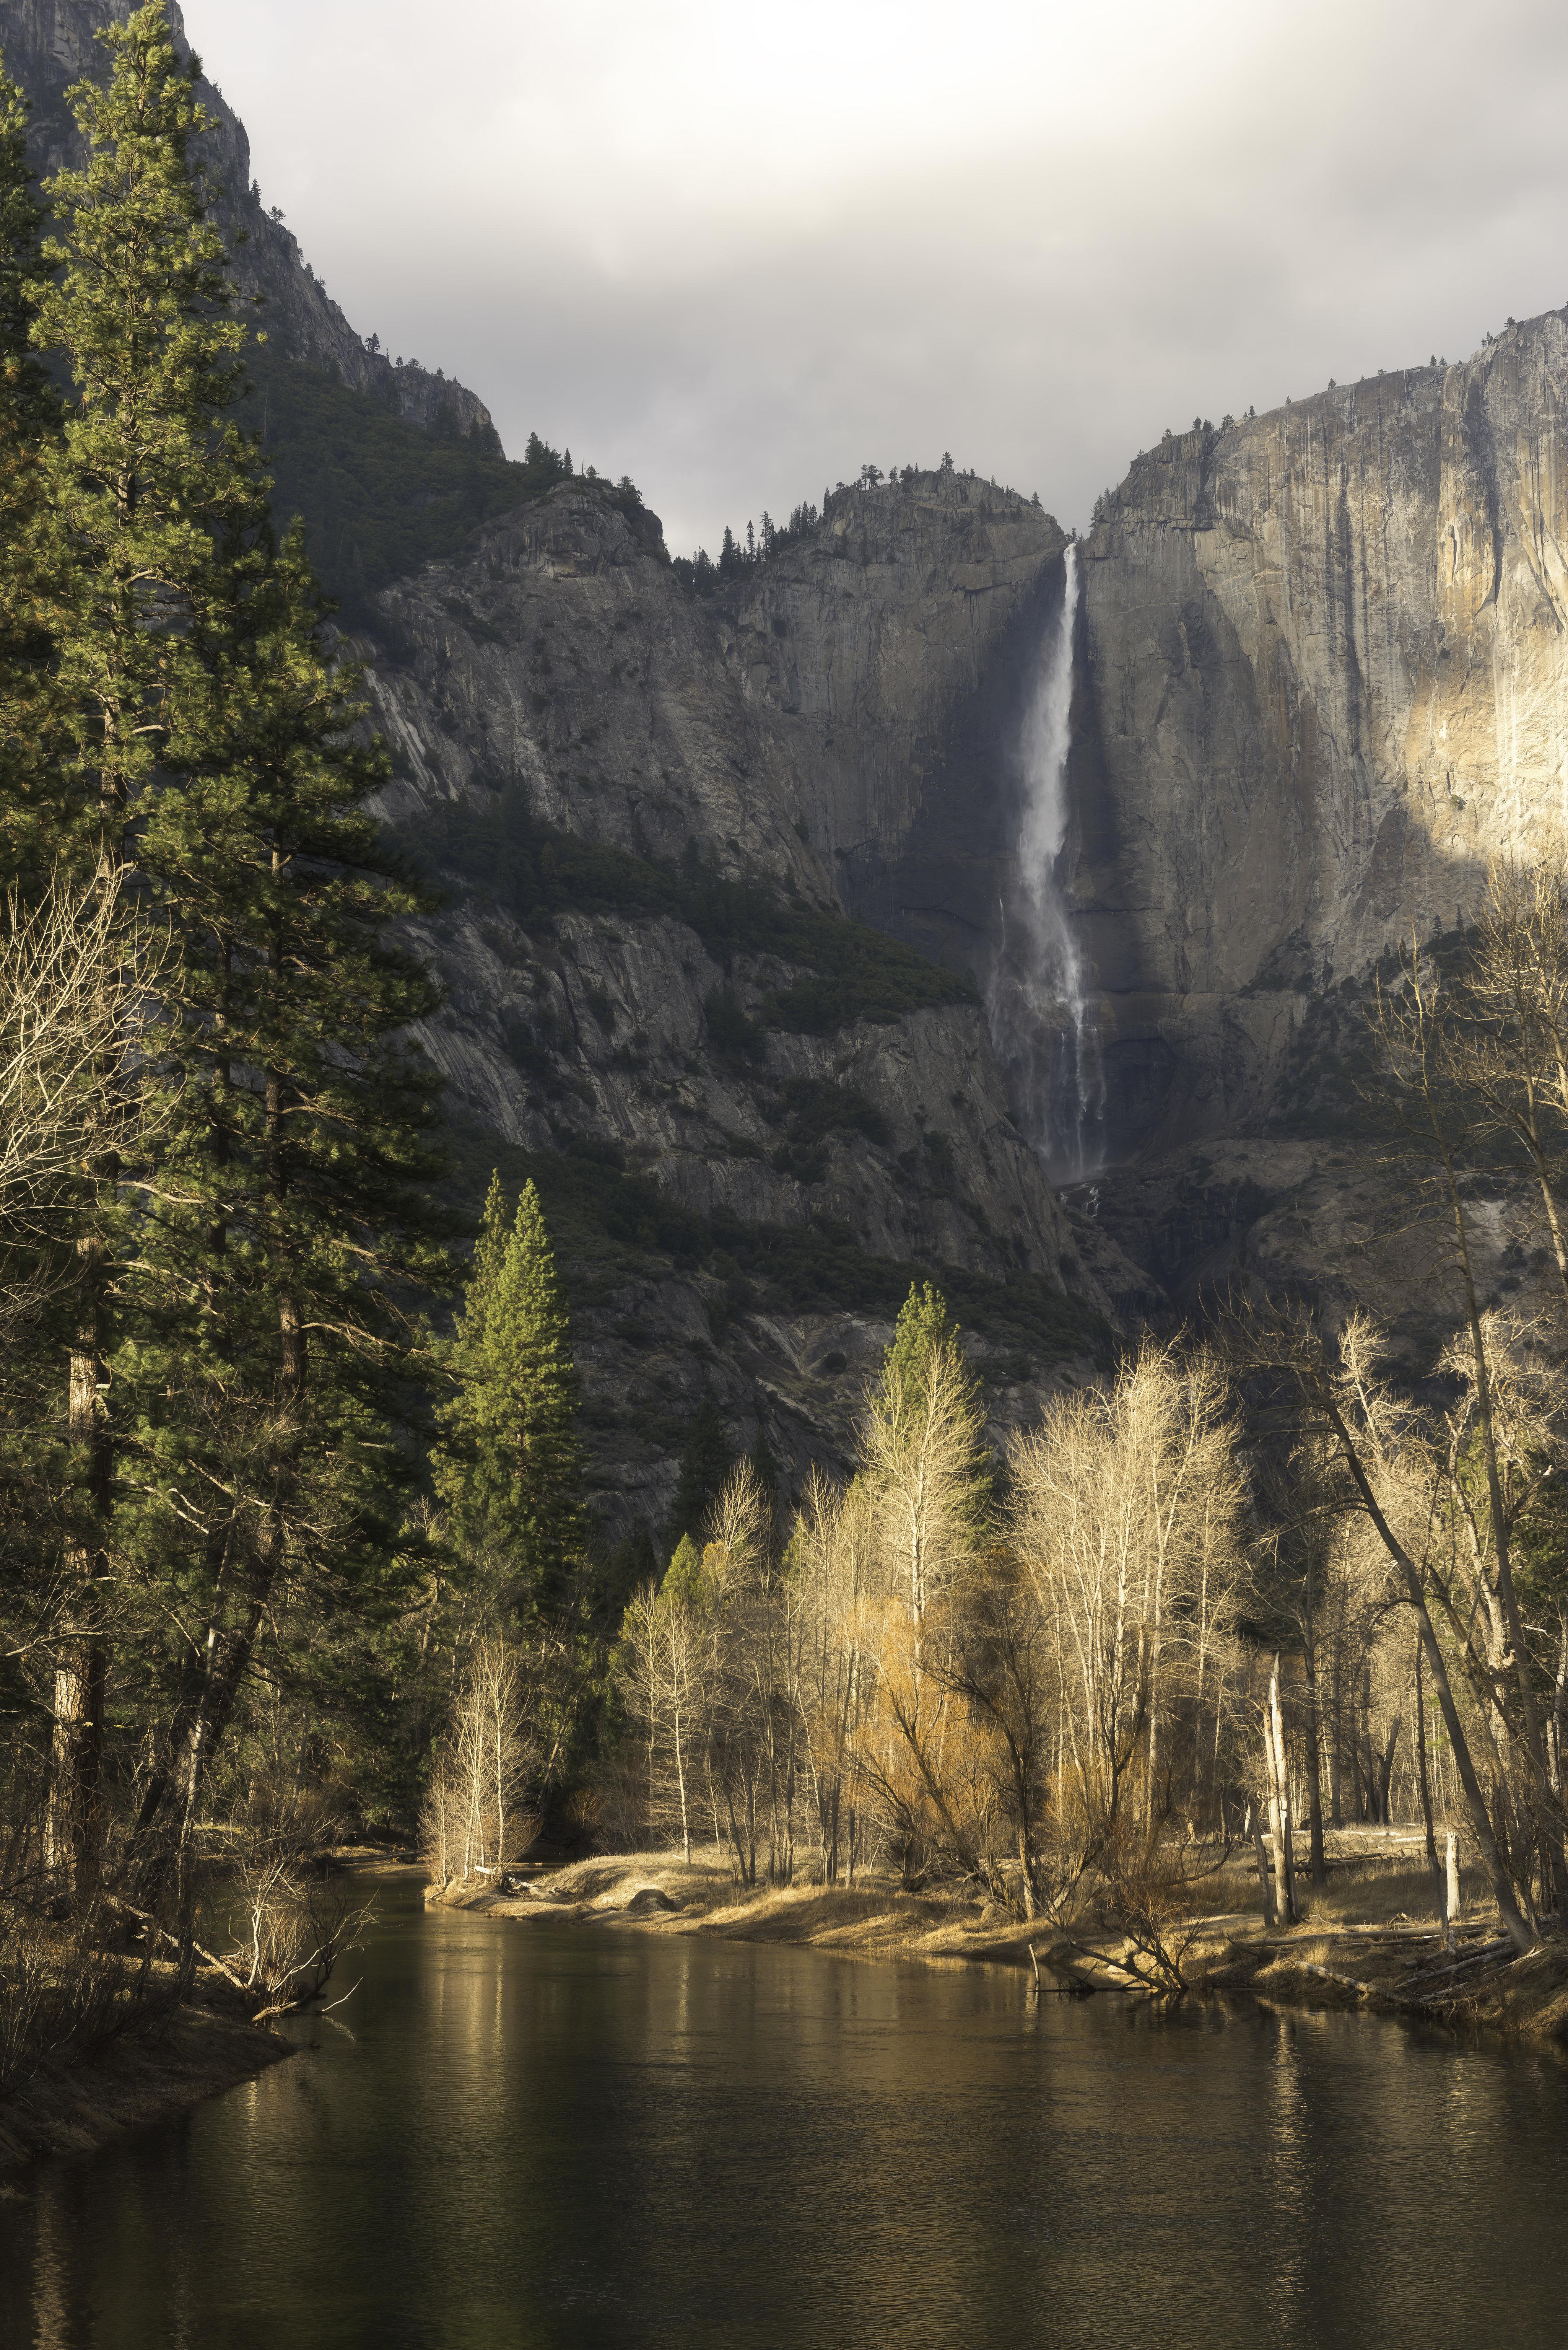 Some gorgeous morning light at Merced River, Yosemite National Park California [4100x6144][oc]